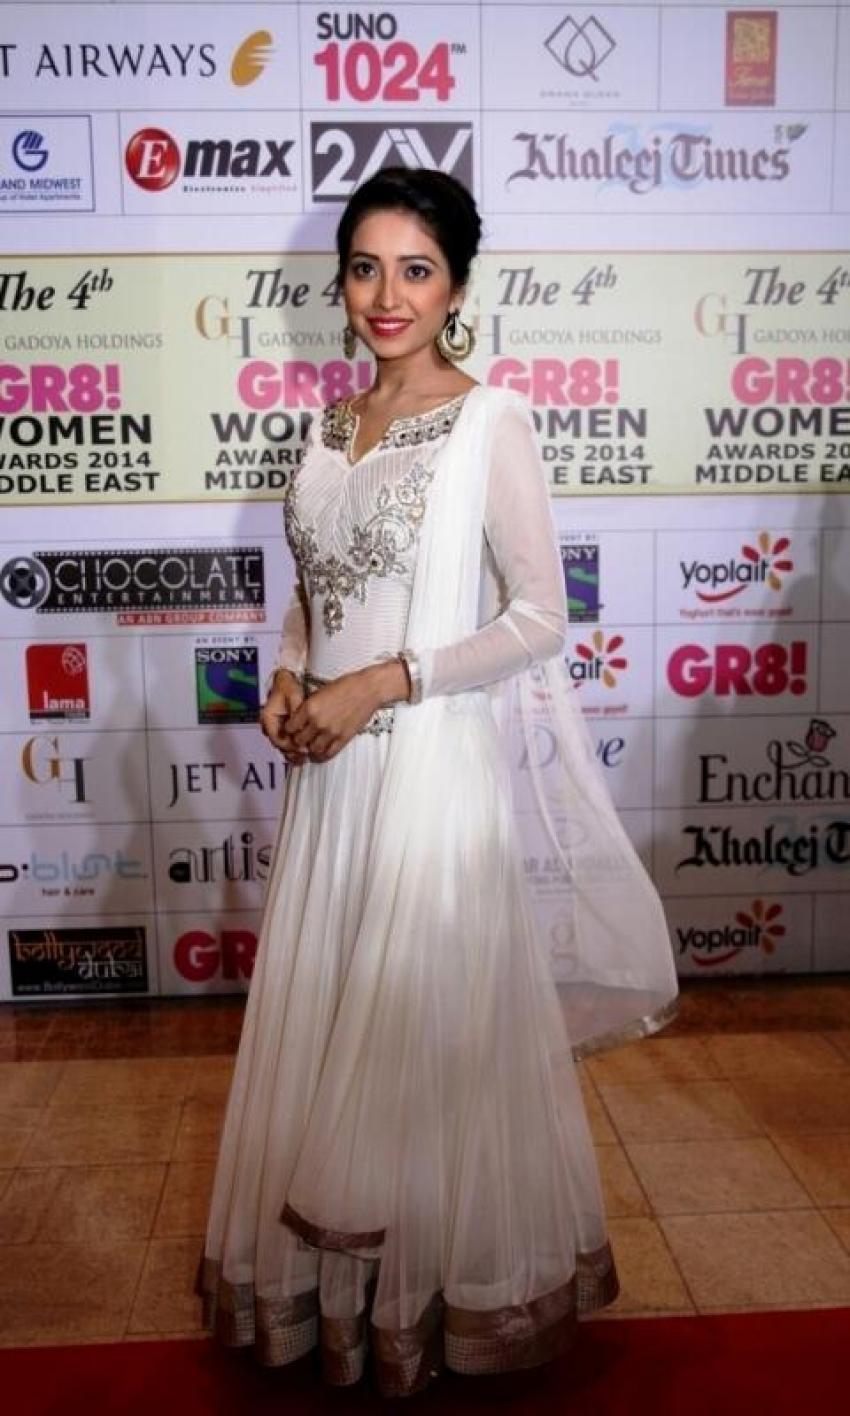 GR8 Women Awards 2014 Photos